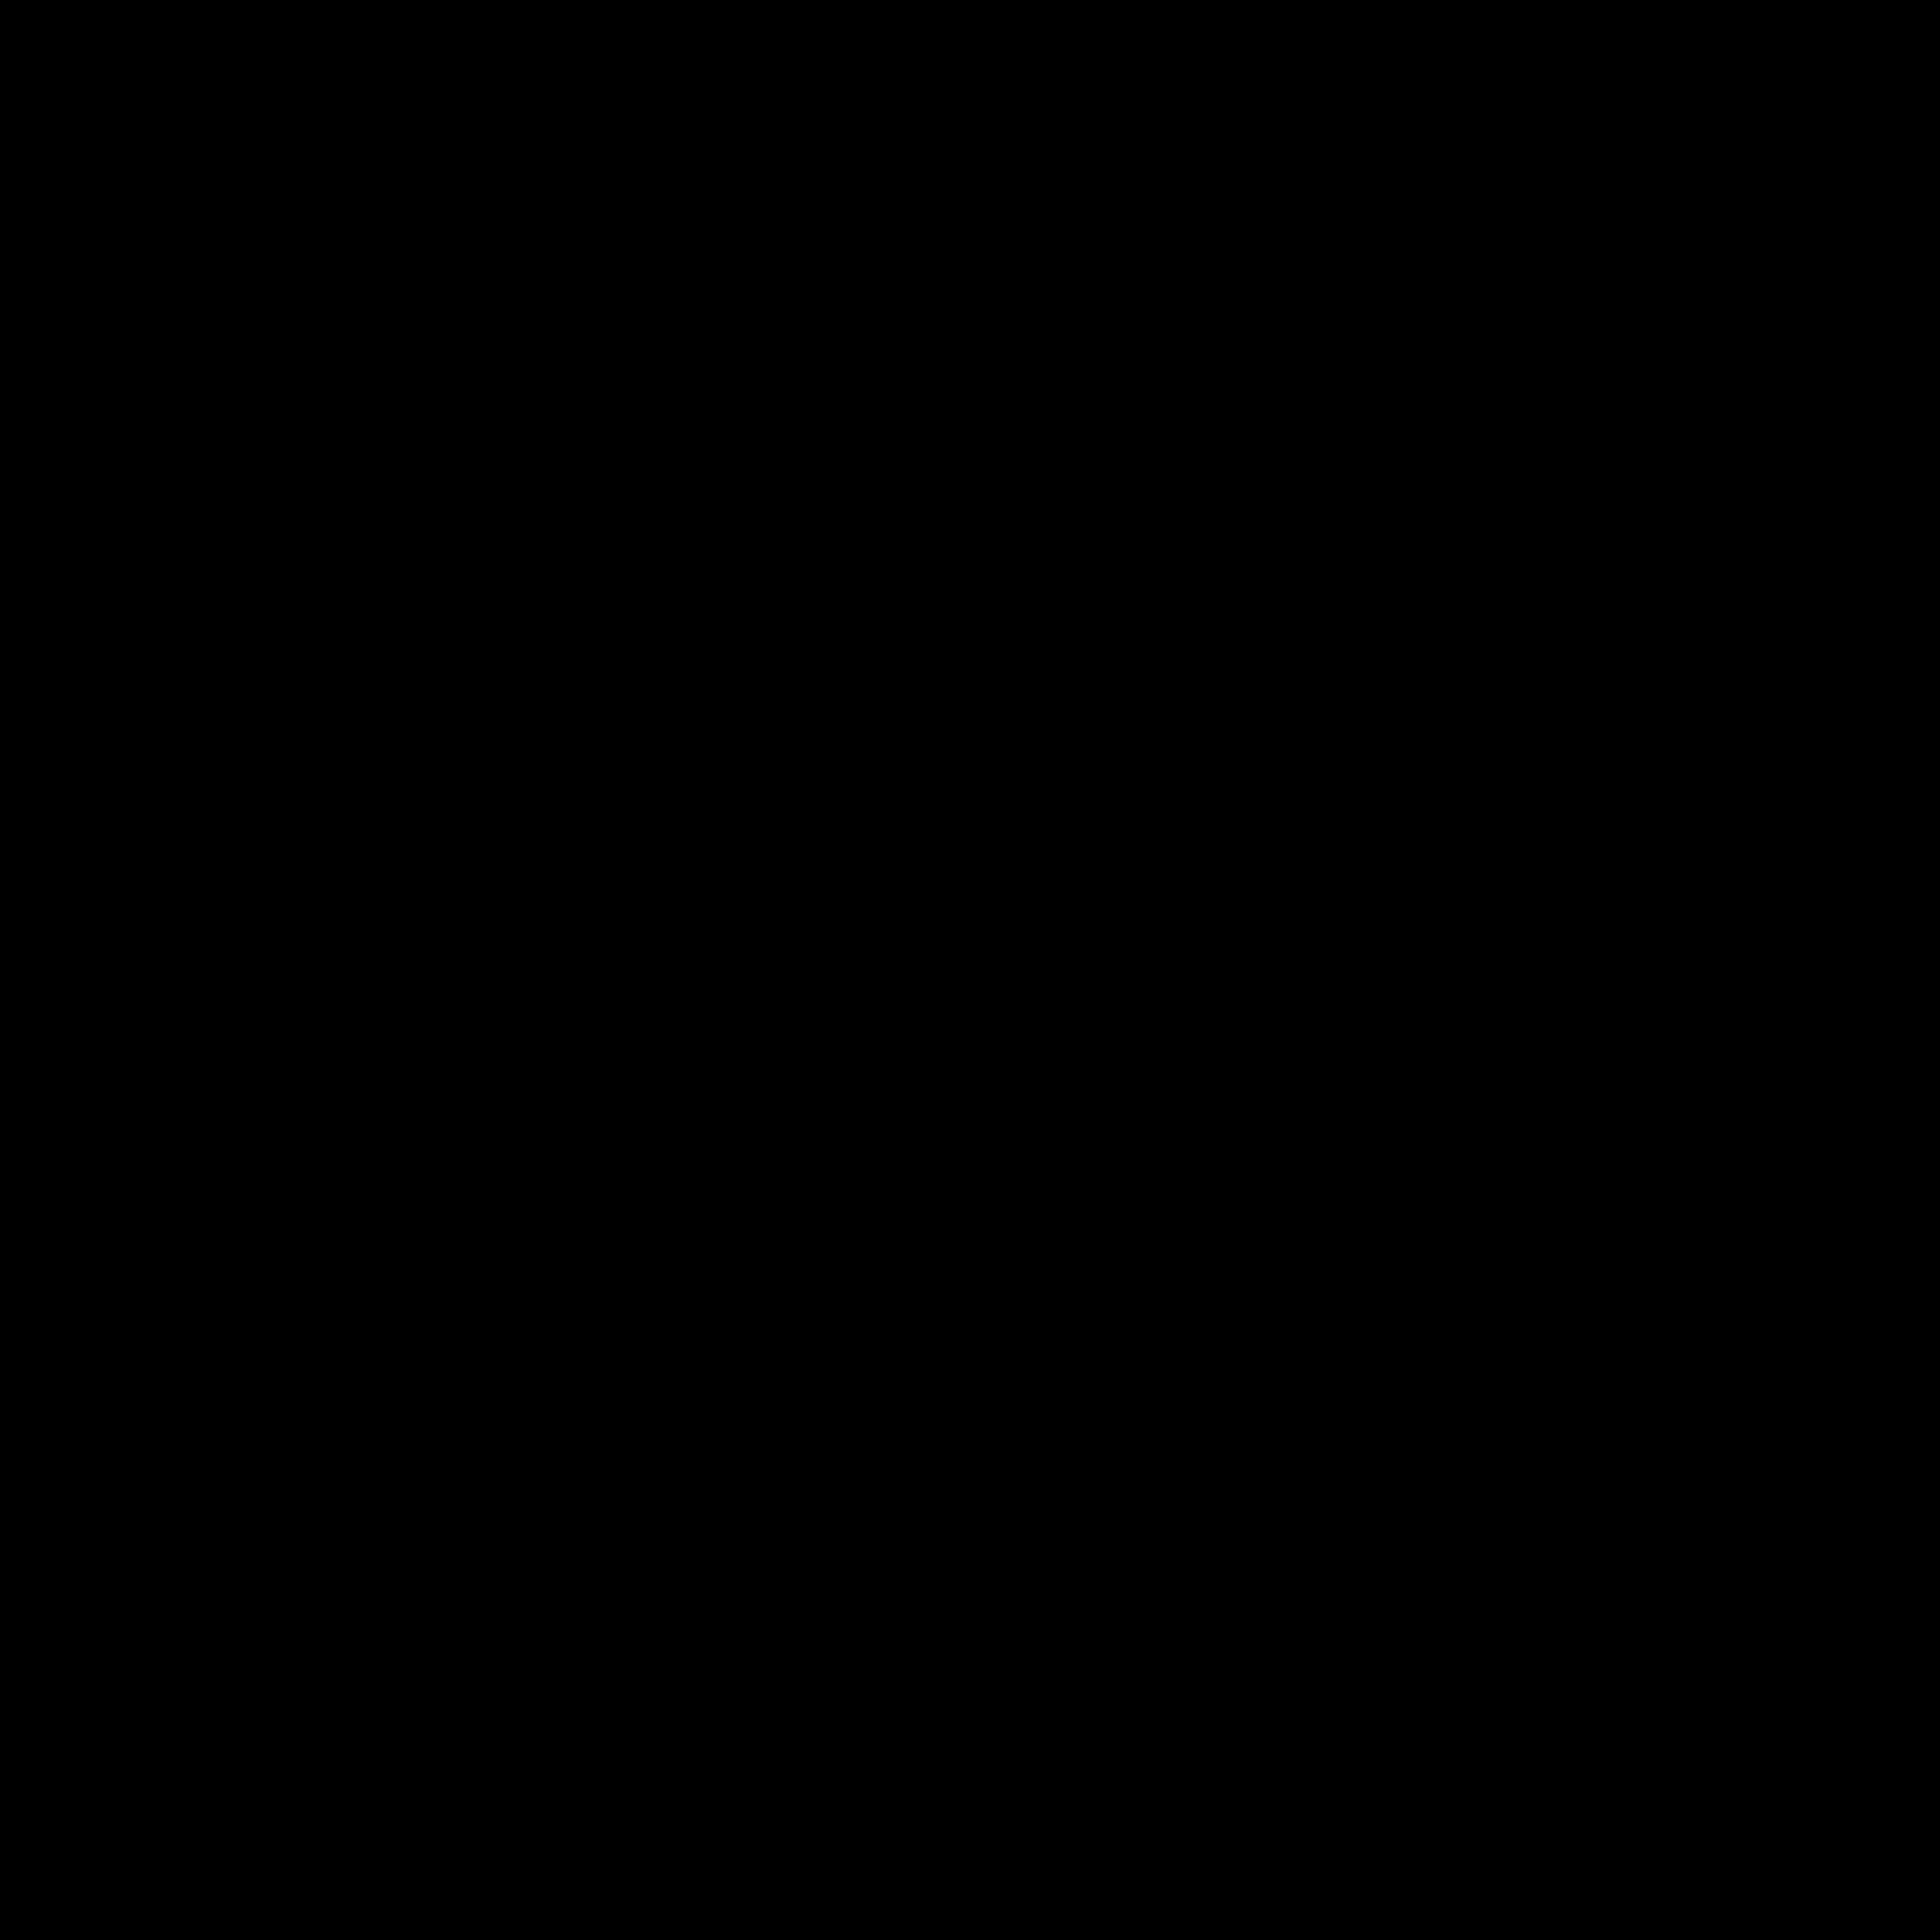 revlon logo png transparent svg vector freebie supply rh freebiesupply com revlon logo png revlon logo history